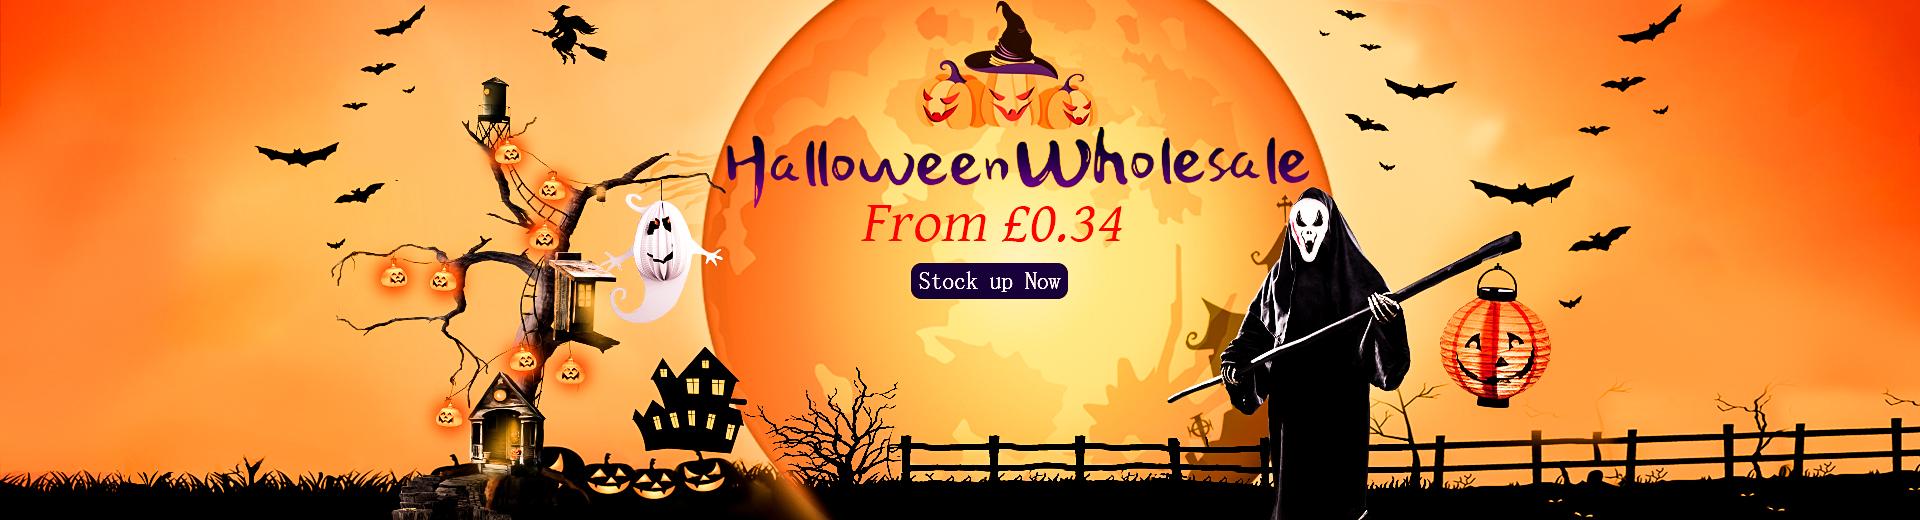 Halloween Wholesale